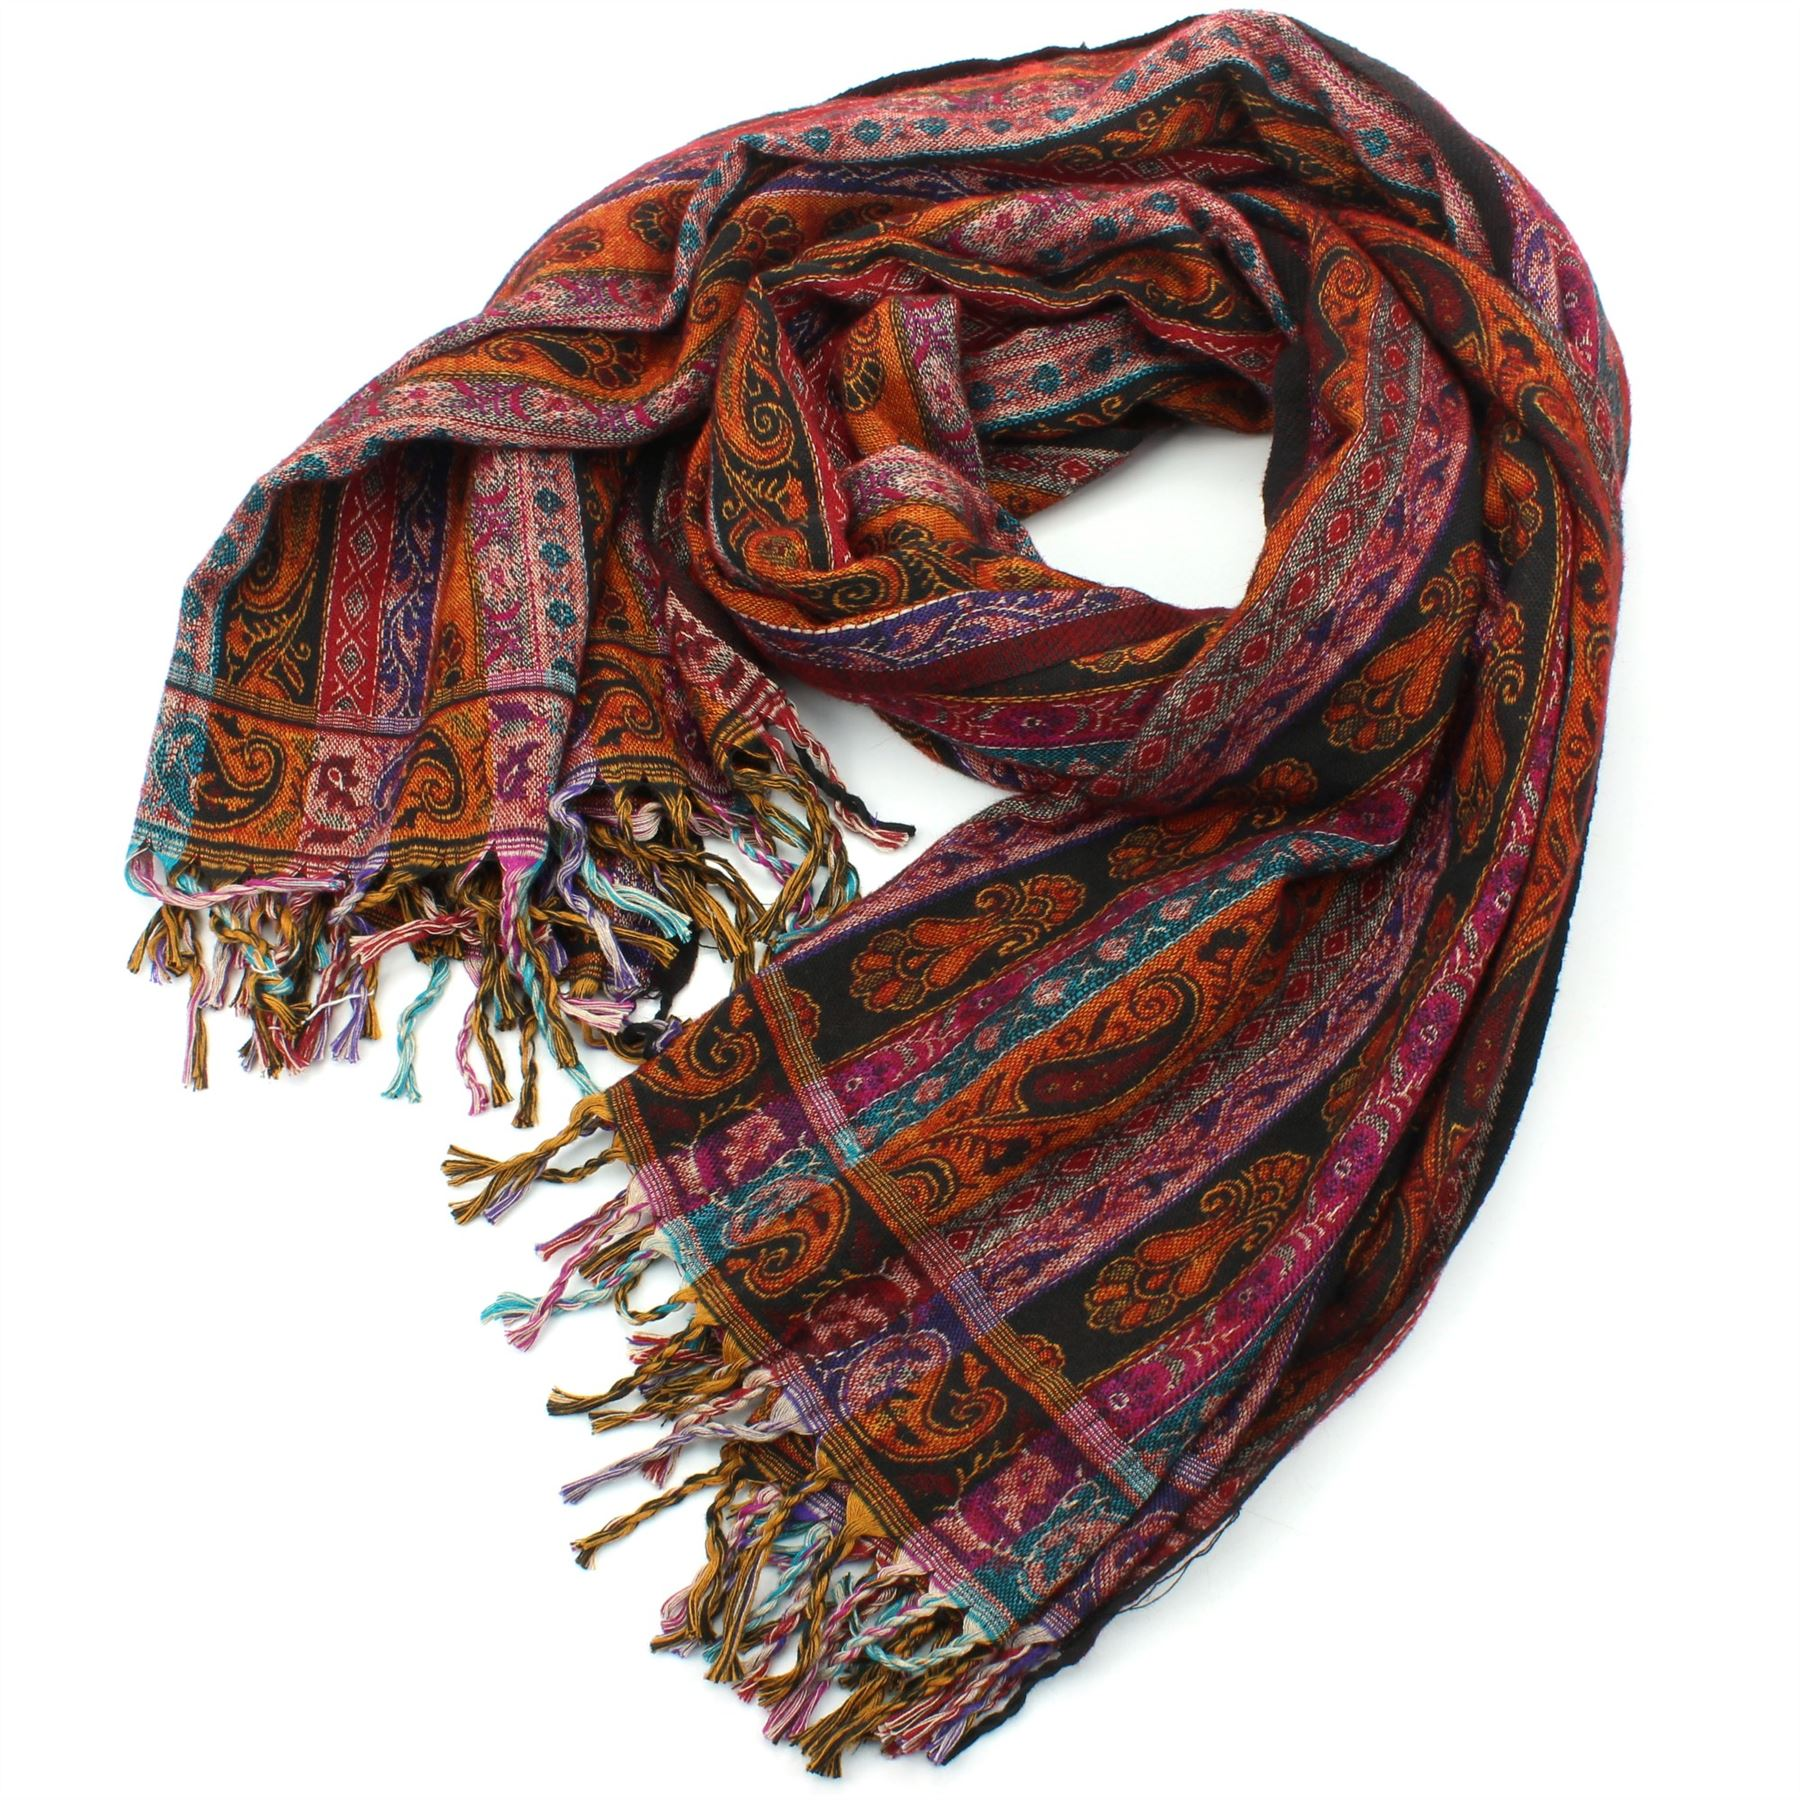 Acrylic-Wool-Blanket-Shawl-Wrap-Throw-Finest-Softest-India-Stripe-Paisley-Travel thumbnail 21